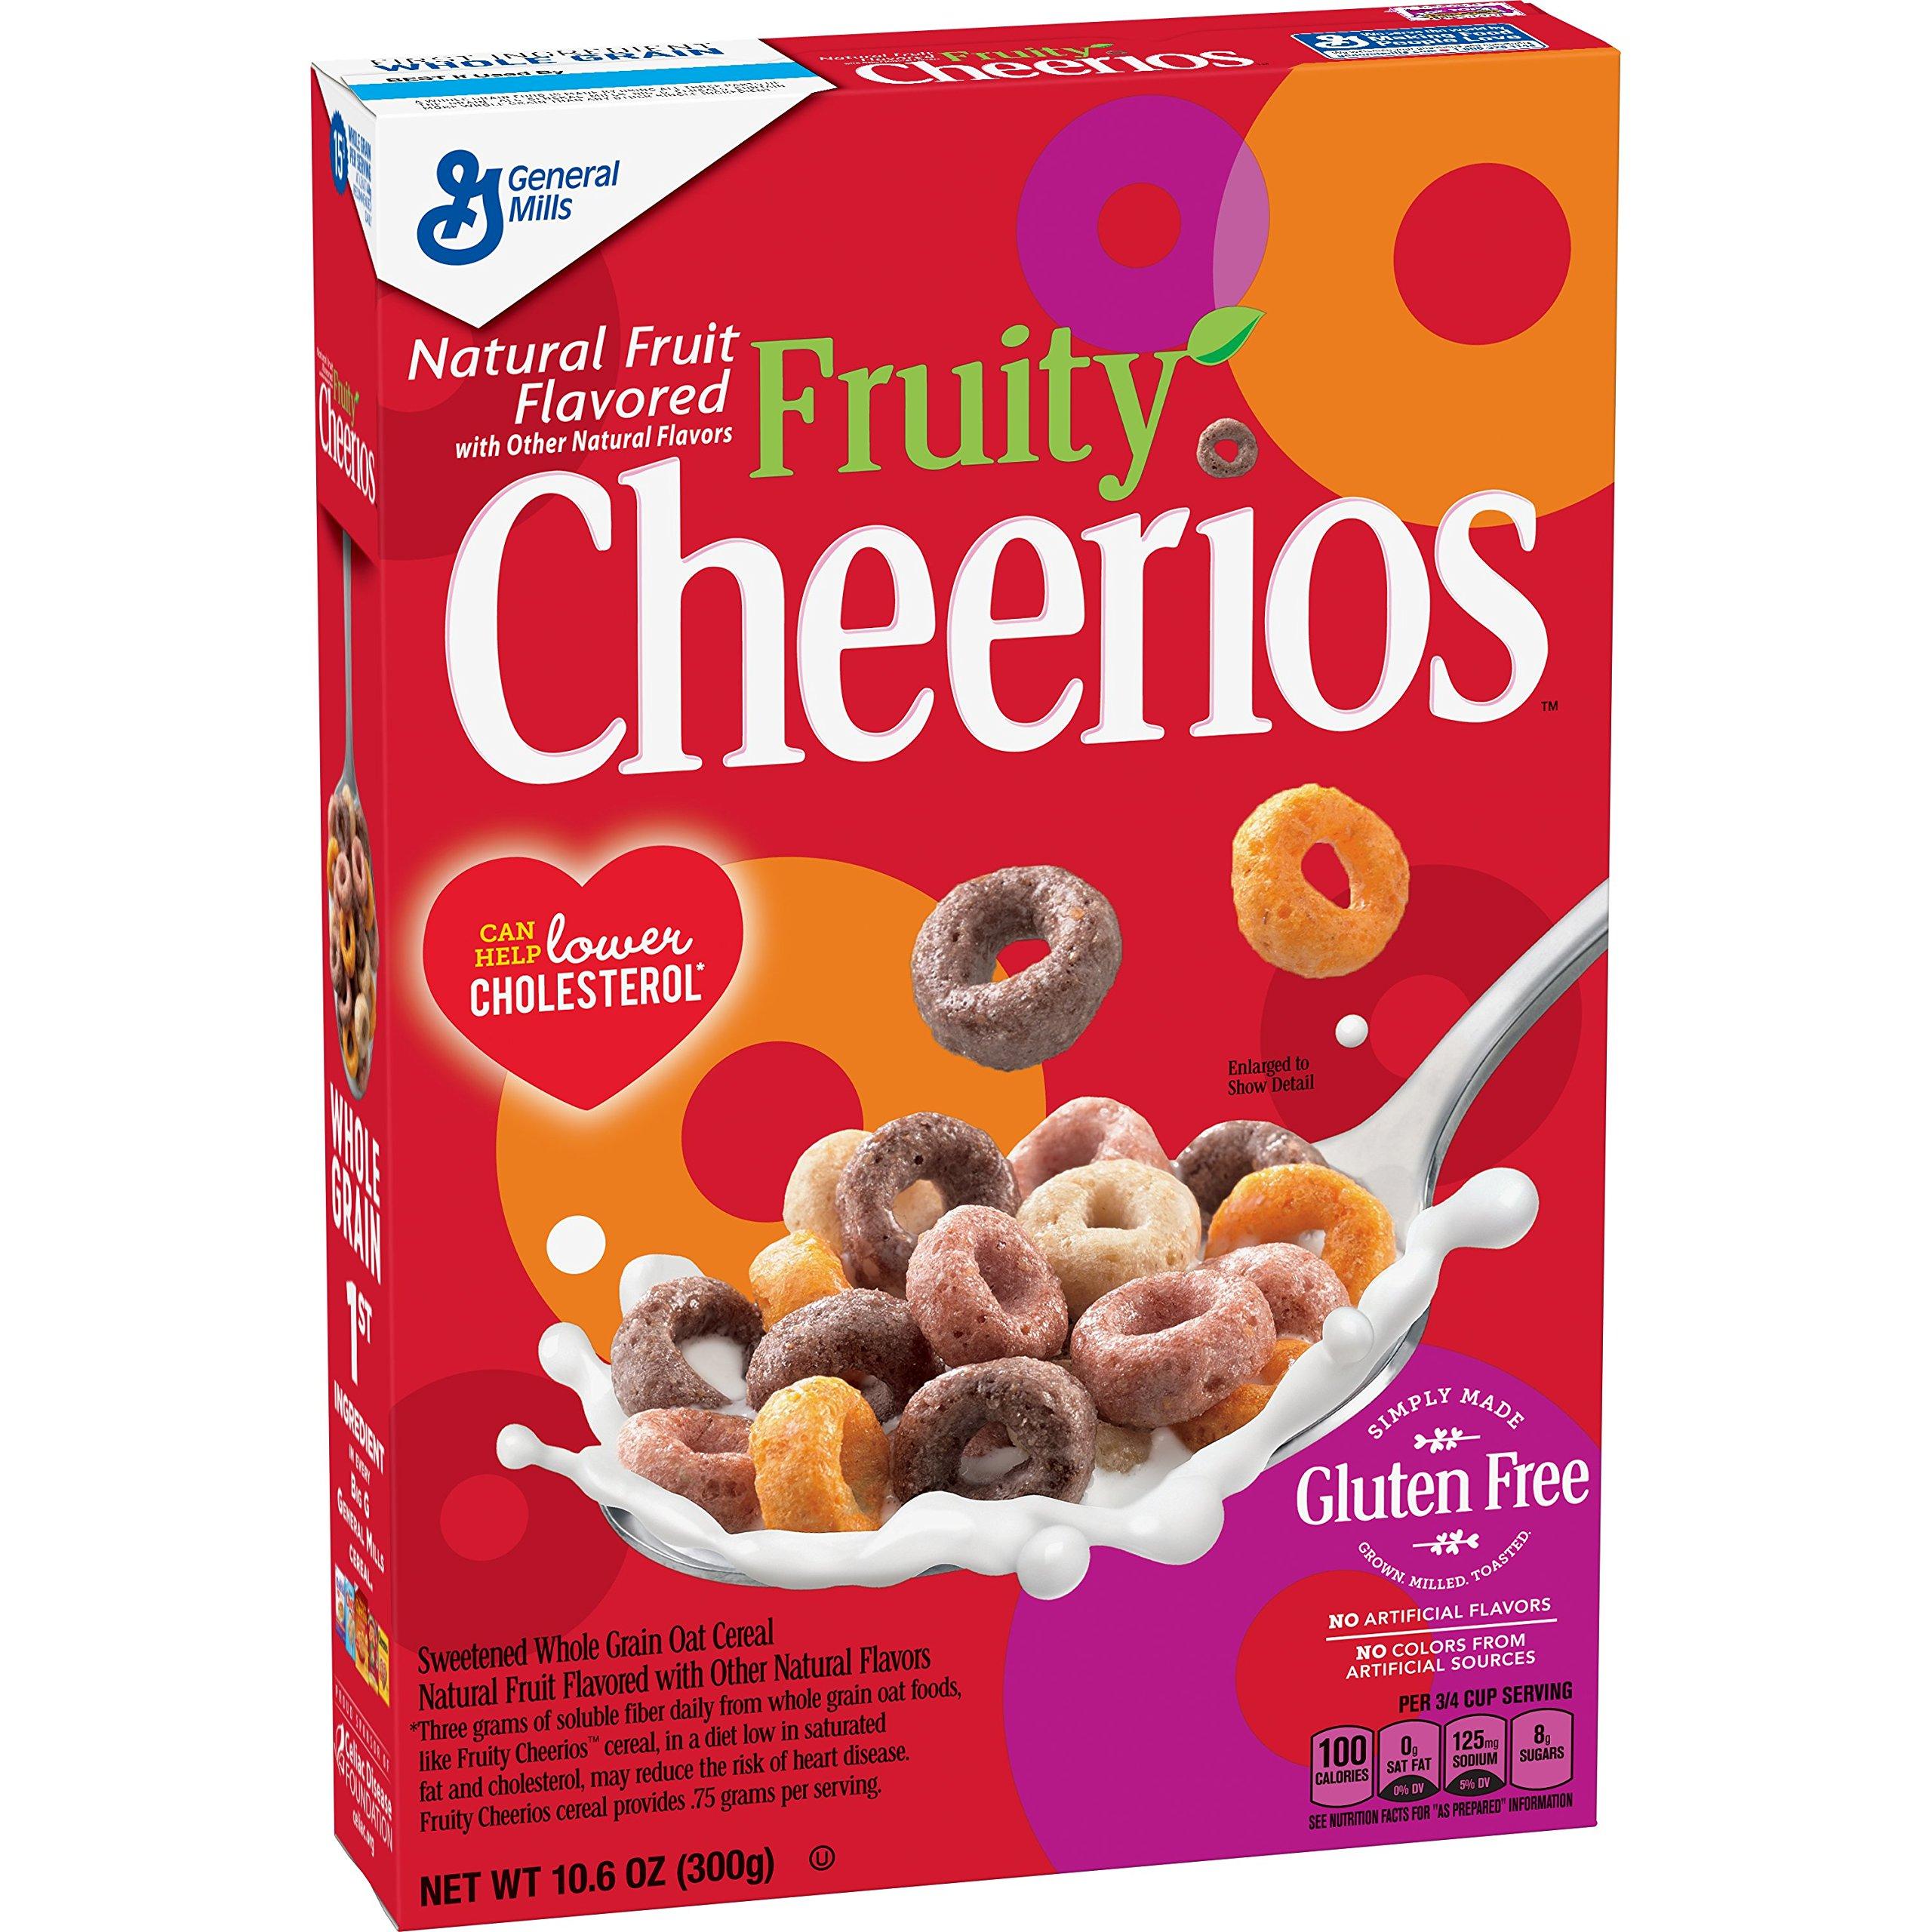 Amazon.com: Chocolate Peanut Butter Cheerios Cereal, 11.3 Oz: